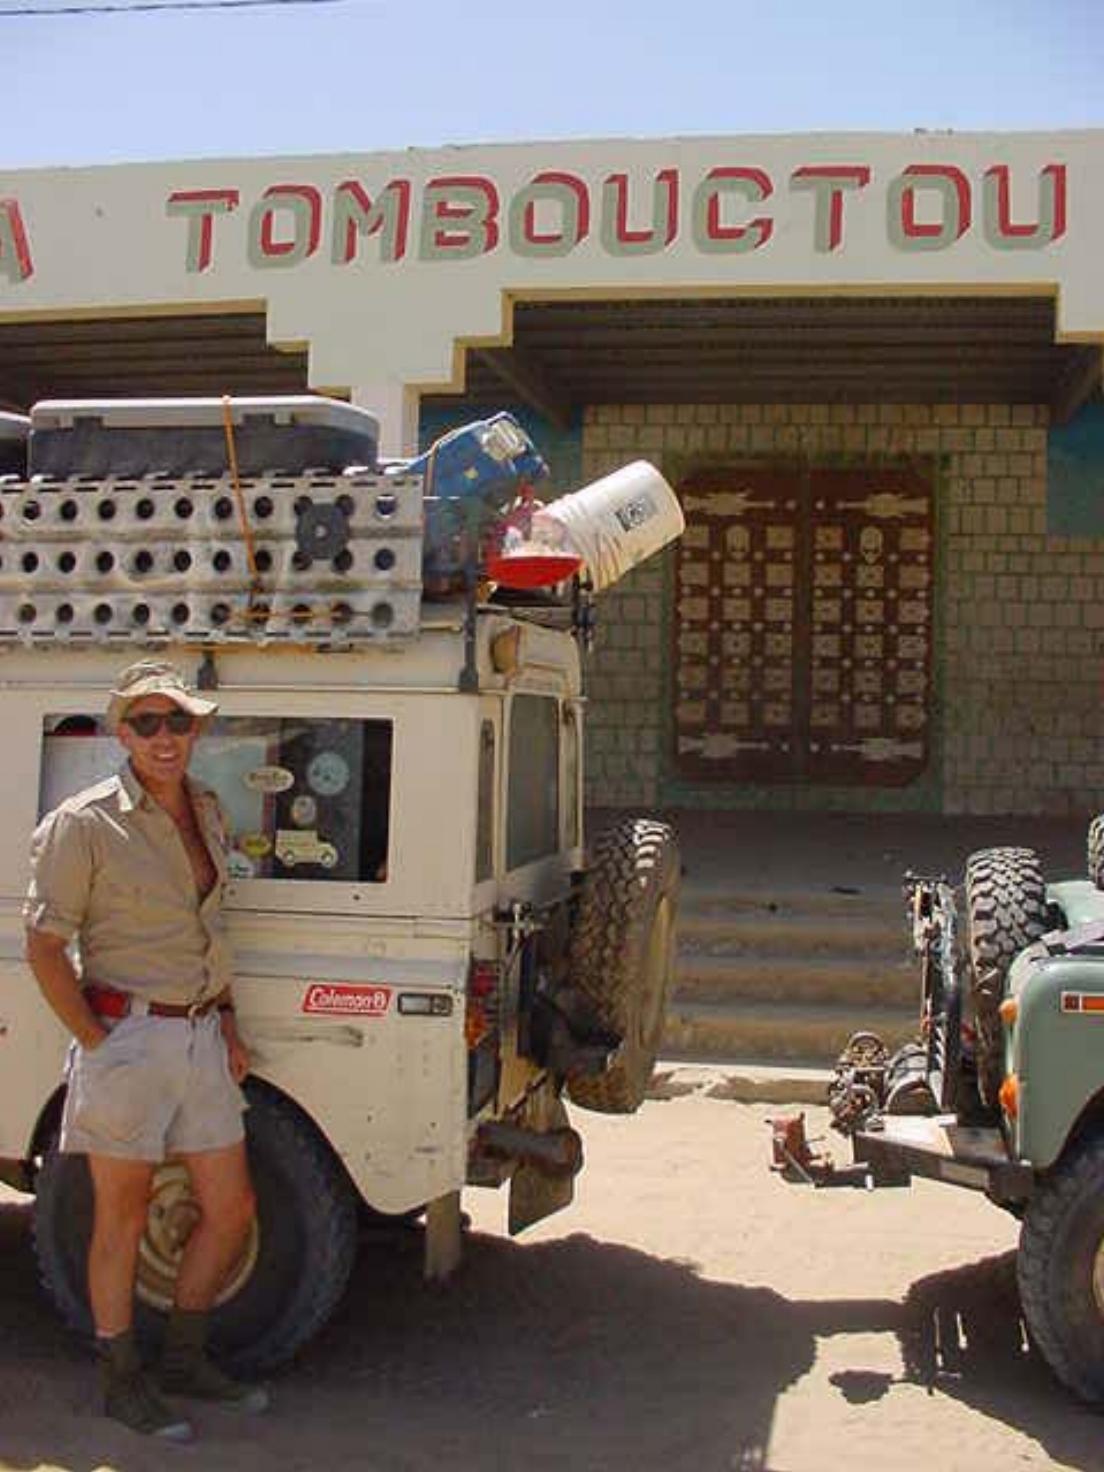 Al Cornell & his vintage Series Land Rover